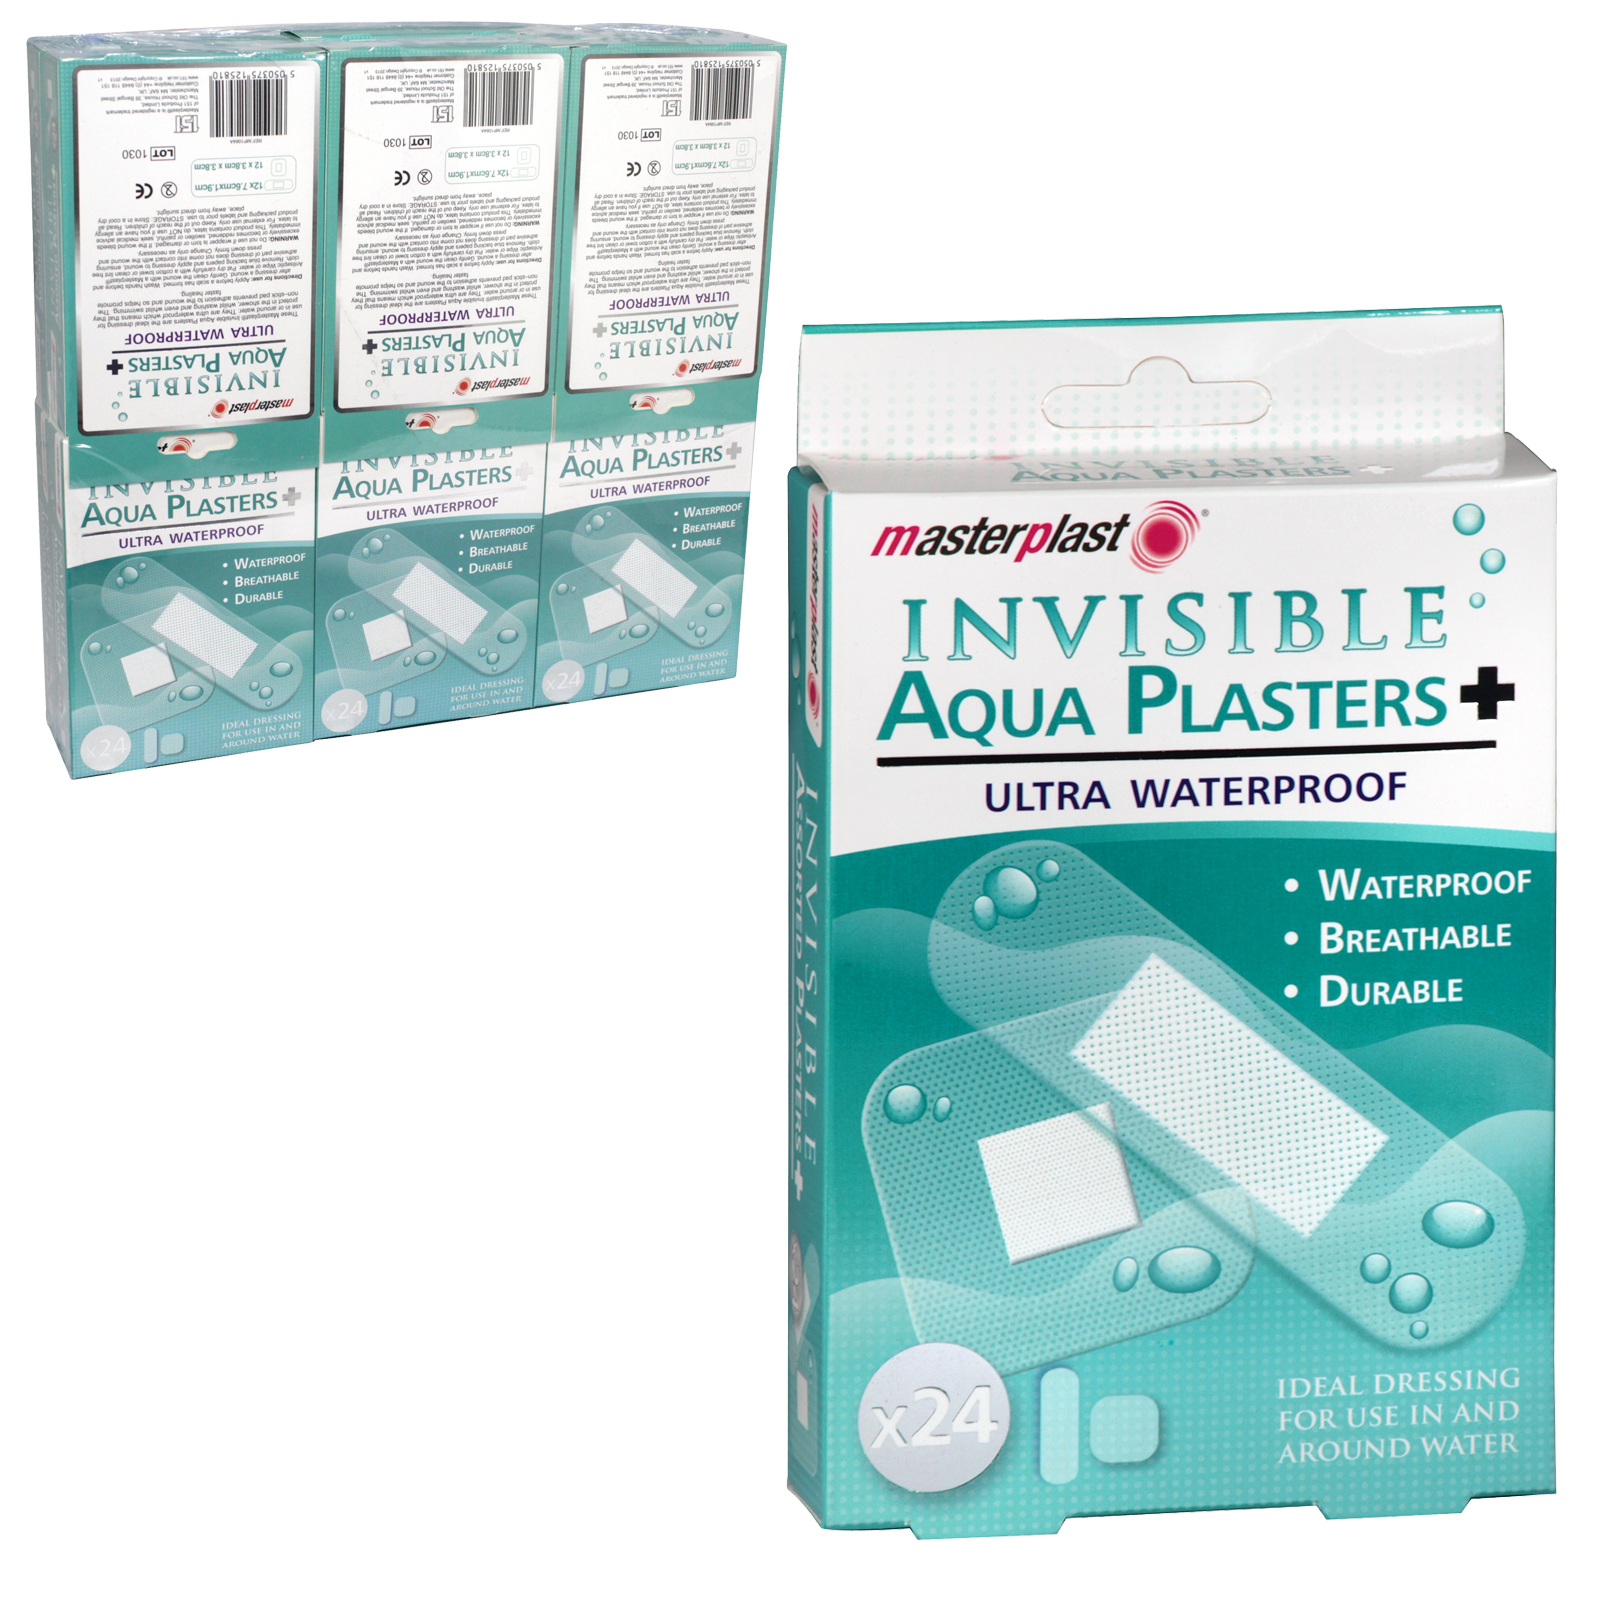 MASTERPLAST 24 INVISIBLE AQUA PLASTERS ULTRA WATERPROOF X12